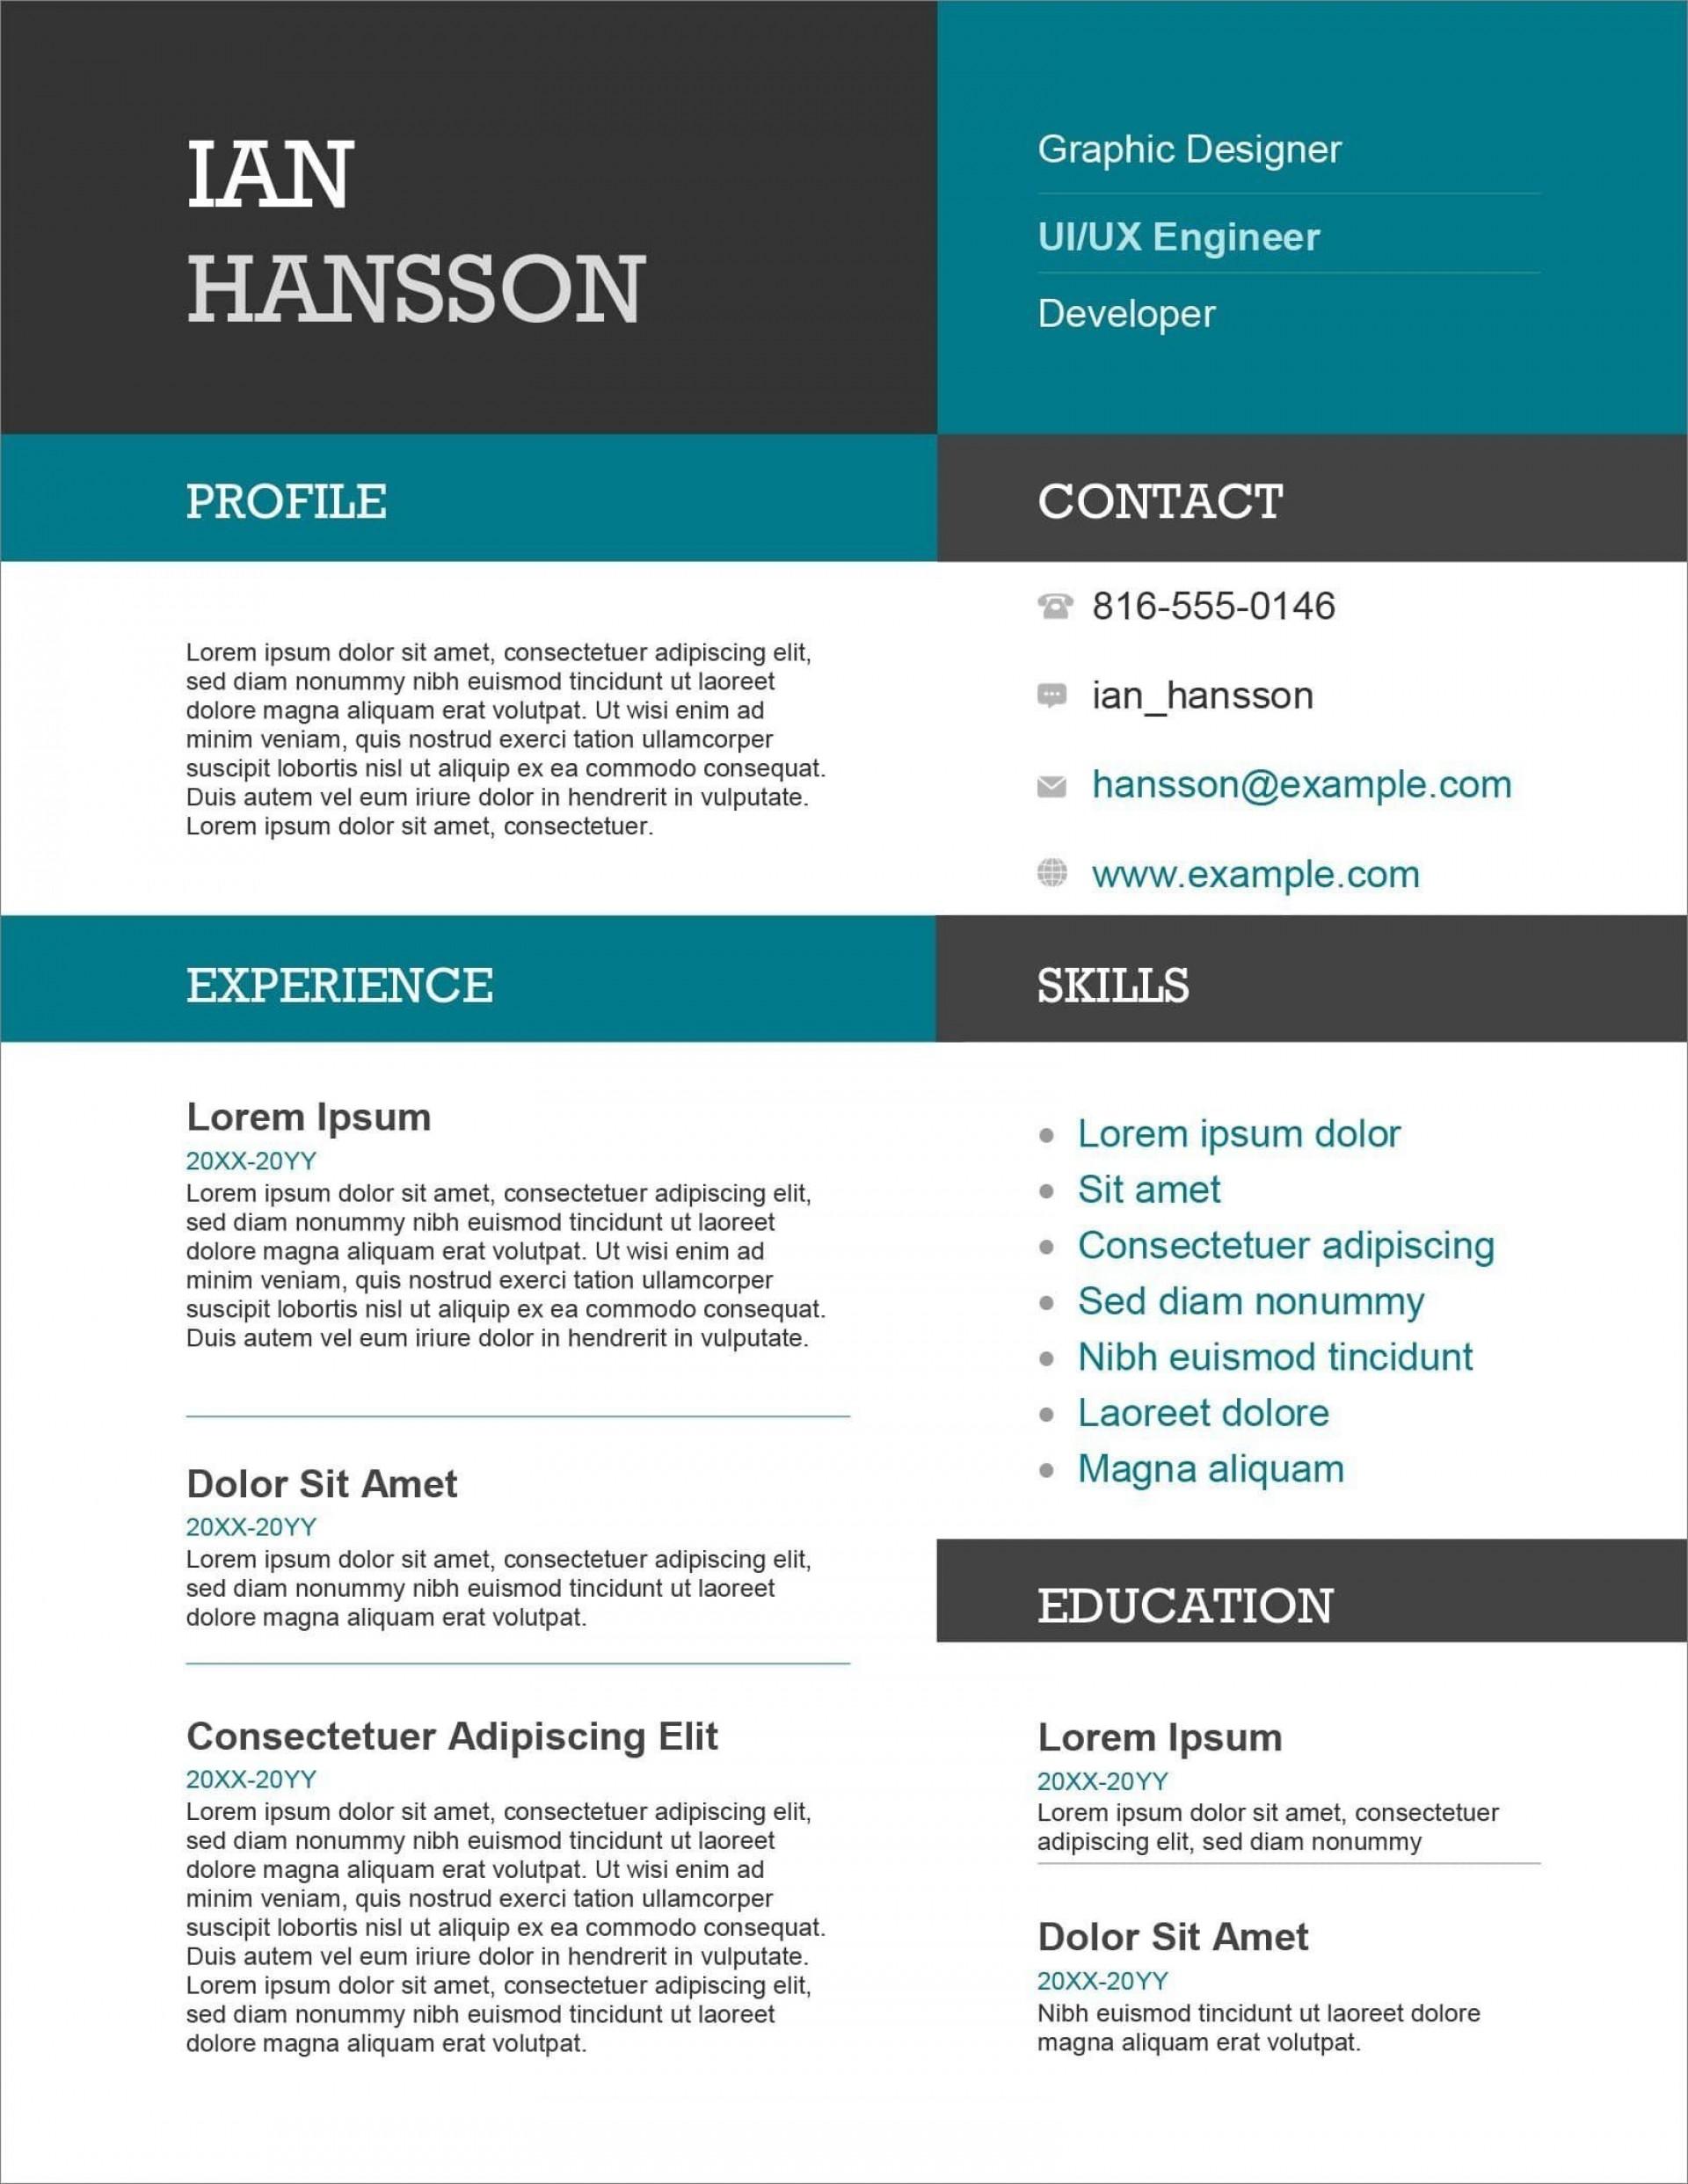 005 Formidable Microsoft Word Resume Template Image  Reddit 2019 2010 Free Download1920